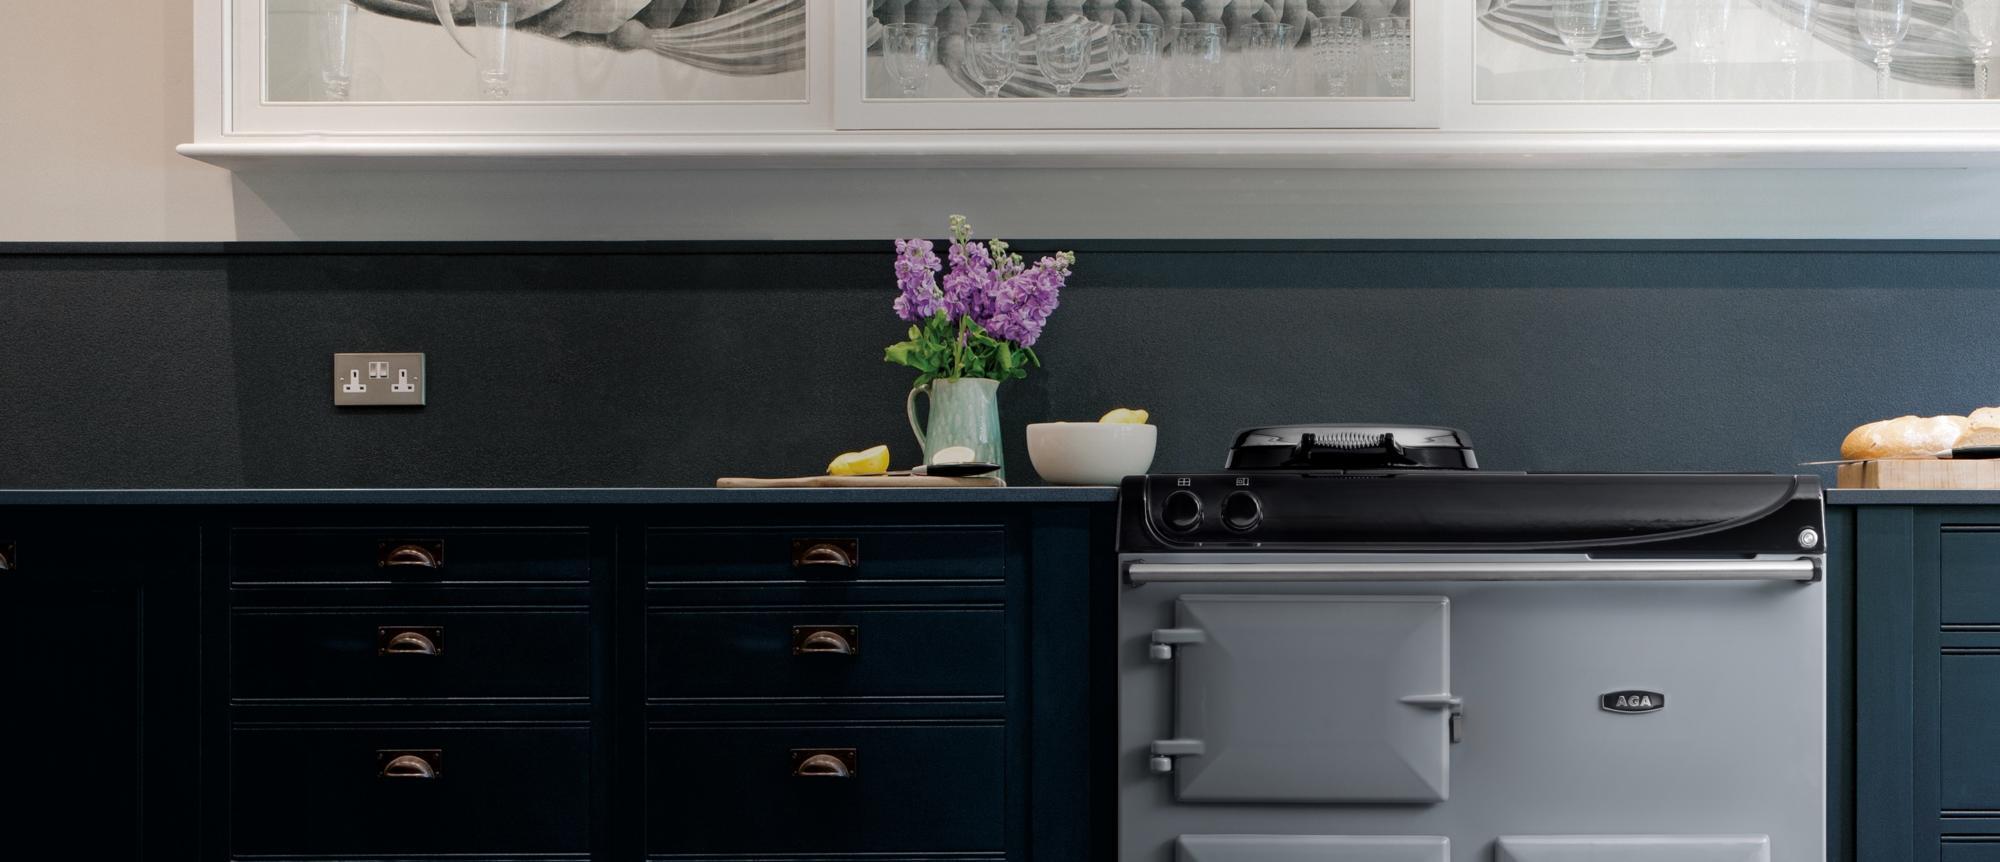 Premium appliances to complement your kitchen